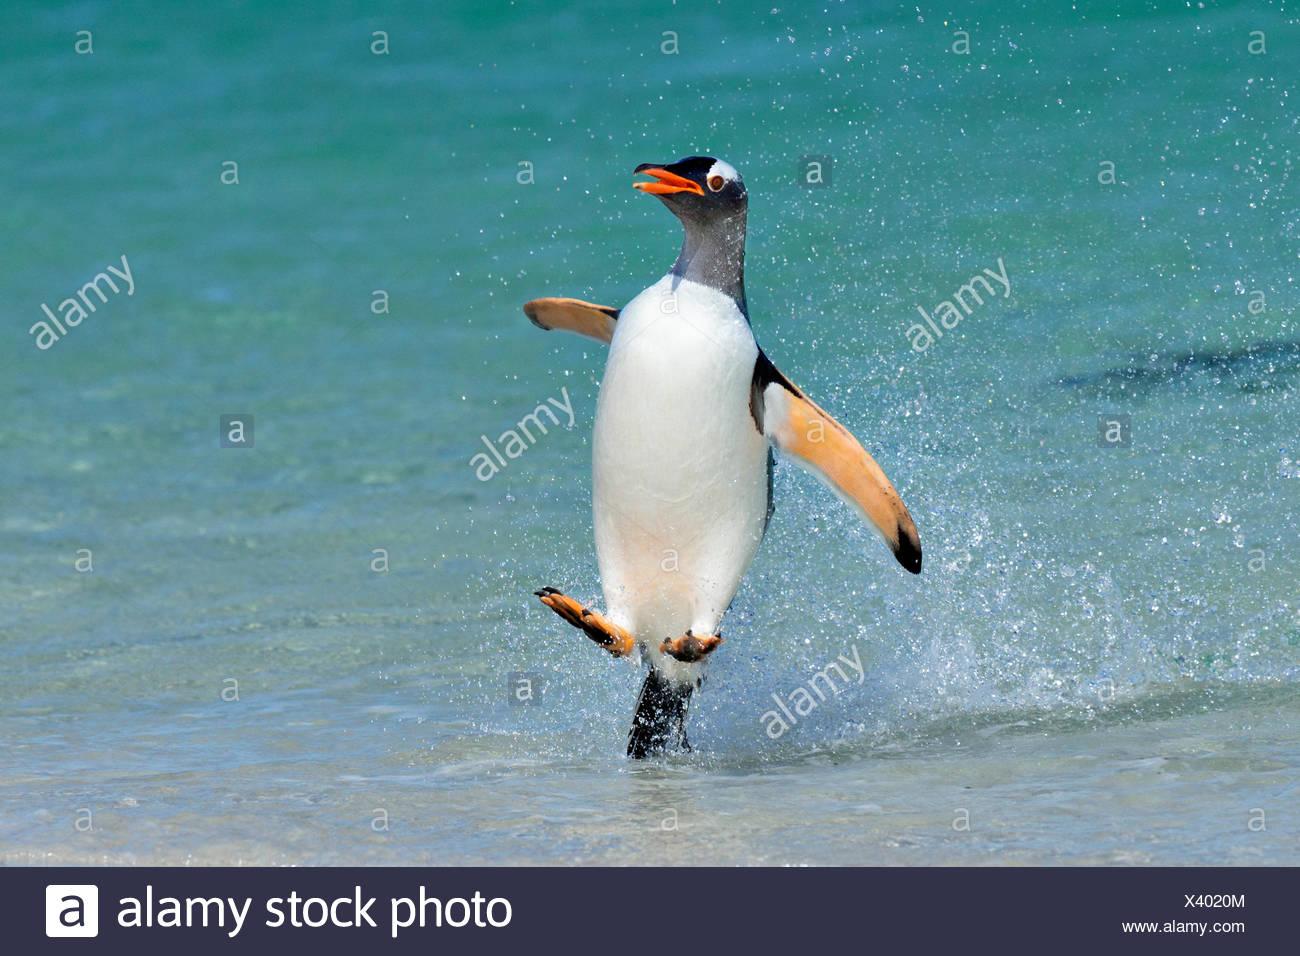 Gentoo penguin (Pygoscelis papua) jumping onto beach, Carcass Island, Falkland Islands. - Stock Image